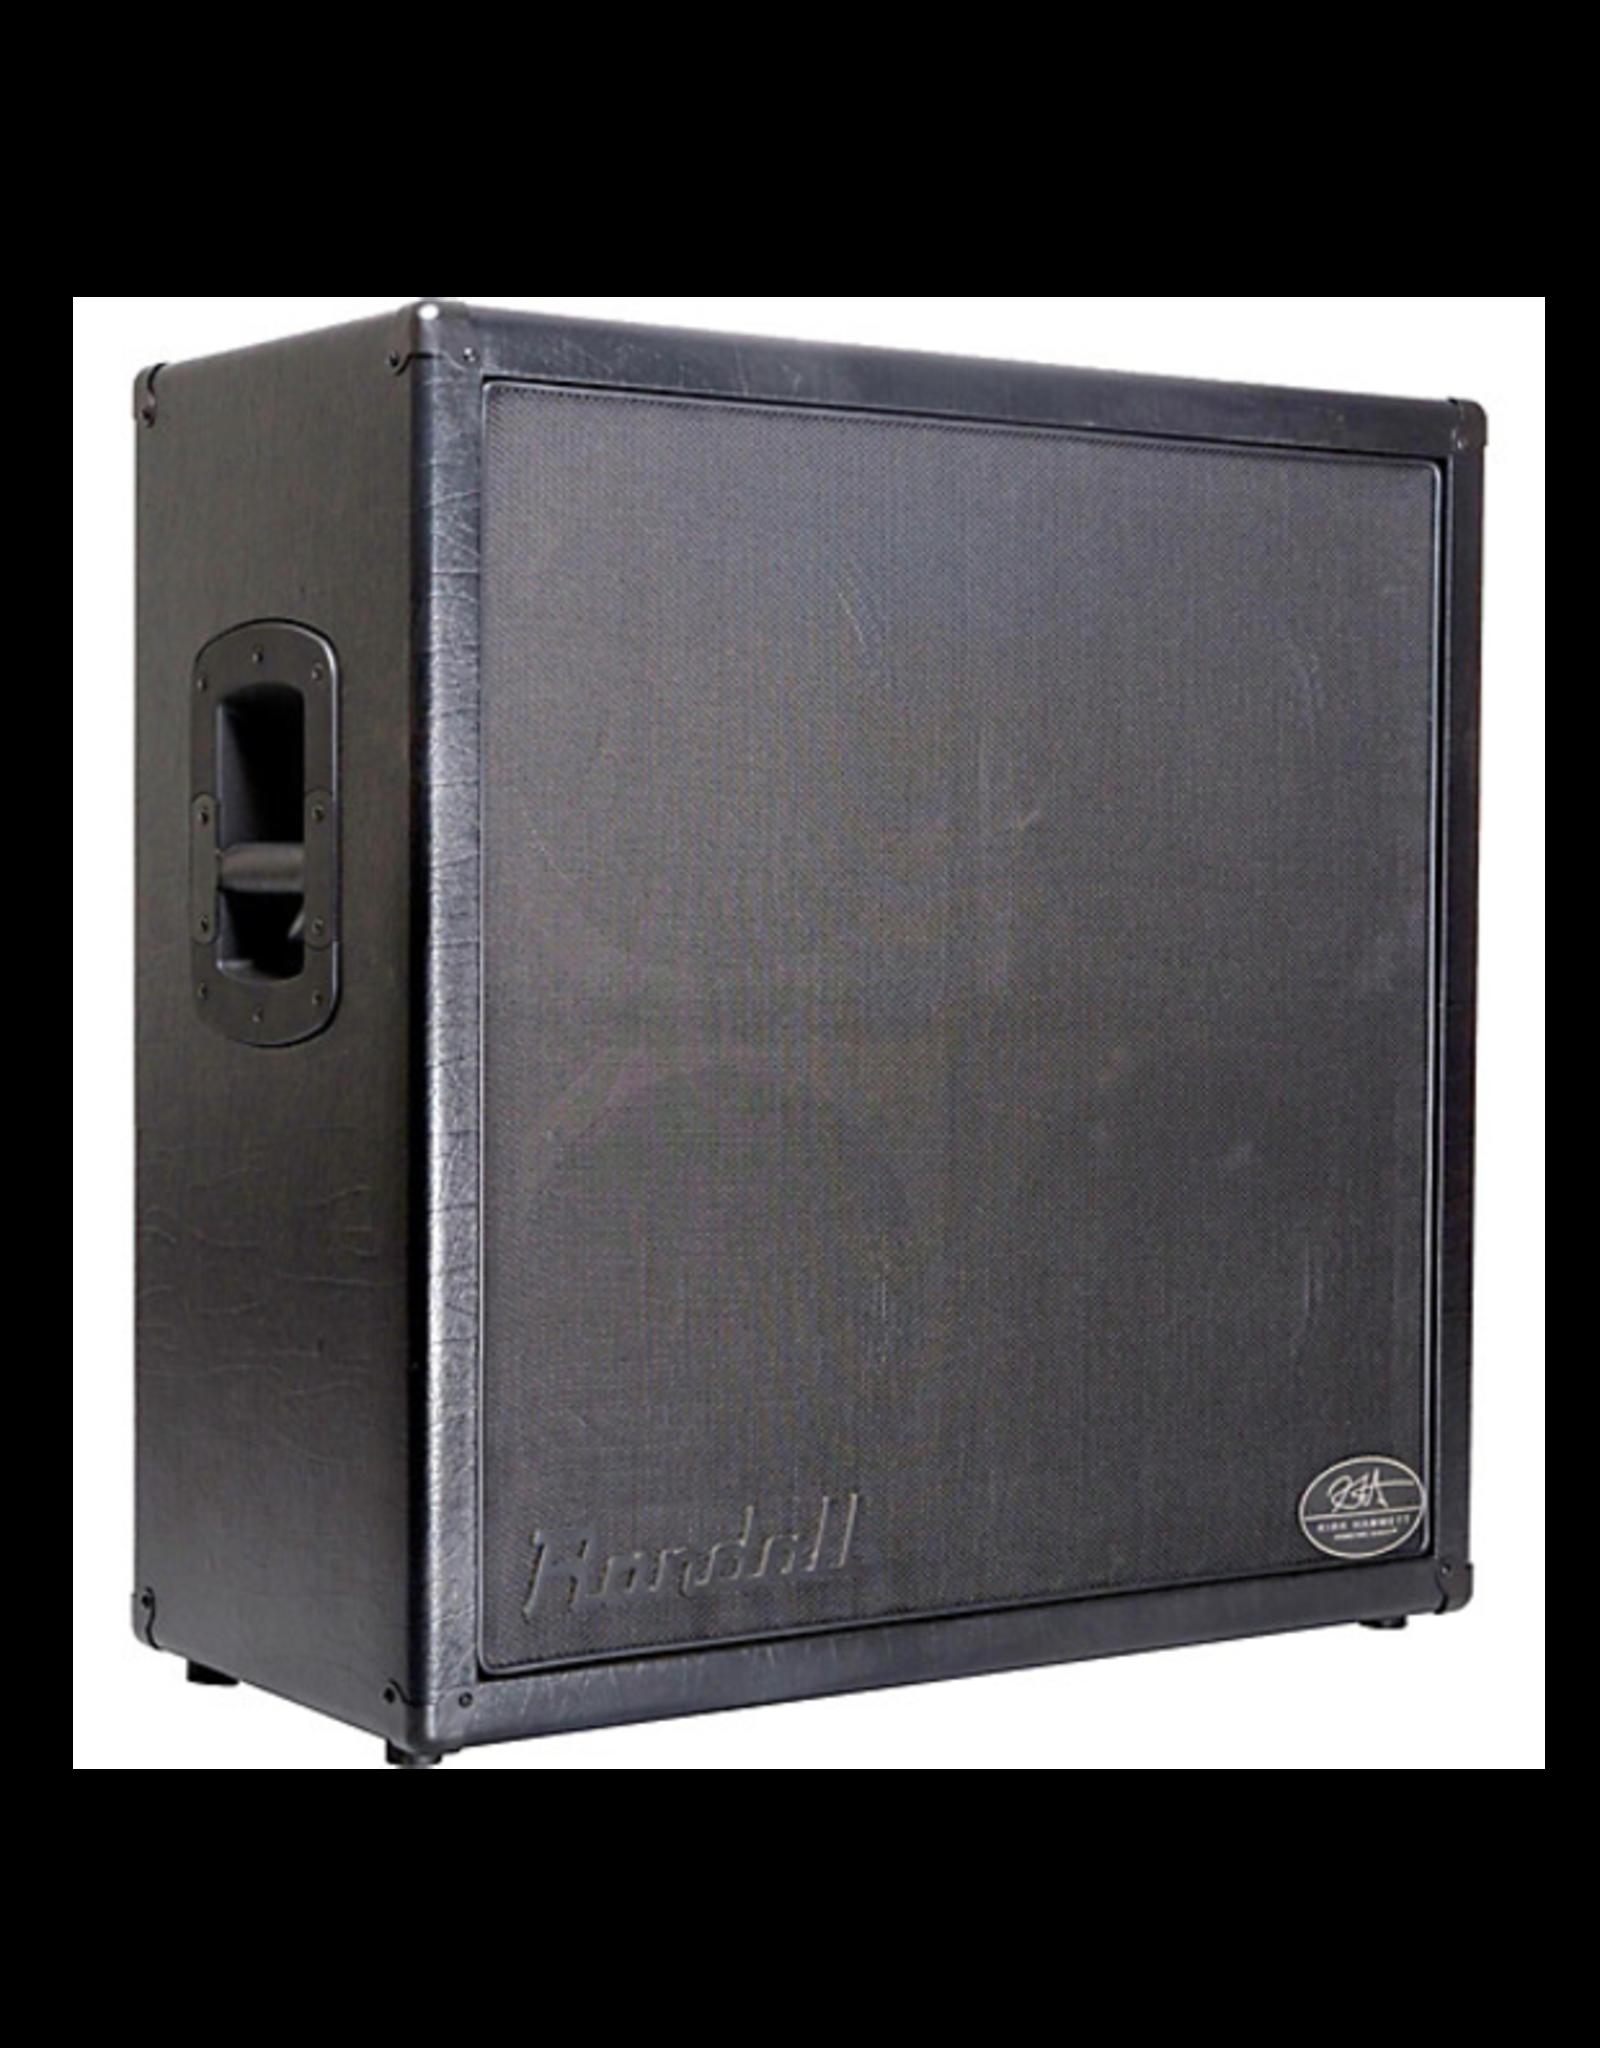 Randall Randall KH412 Kirk Hammett Signature 240 W 4x12 Guitar Speaker Cabinet